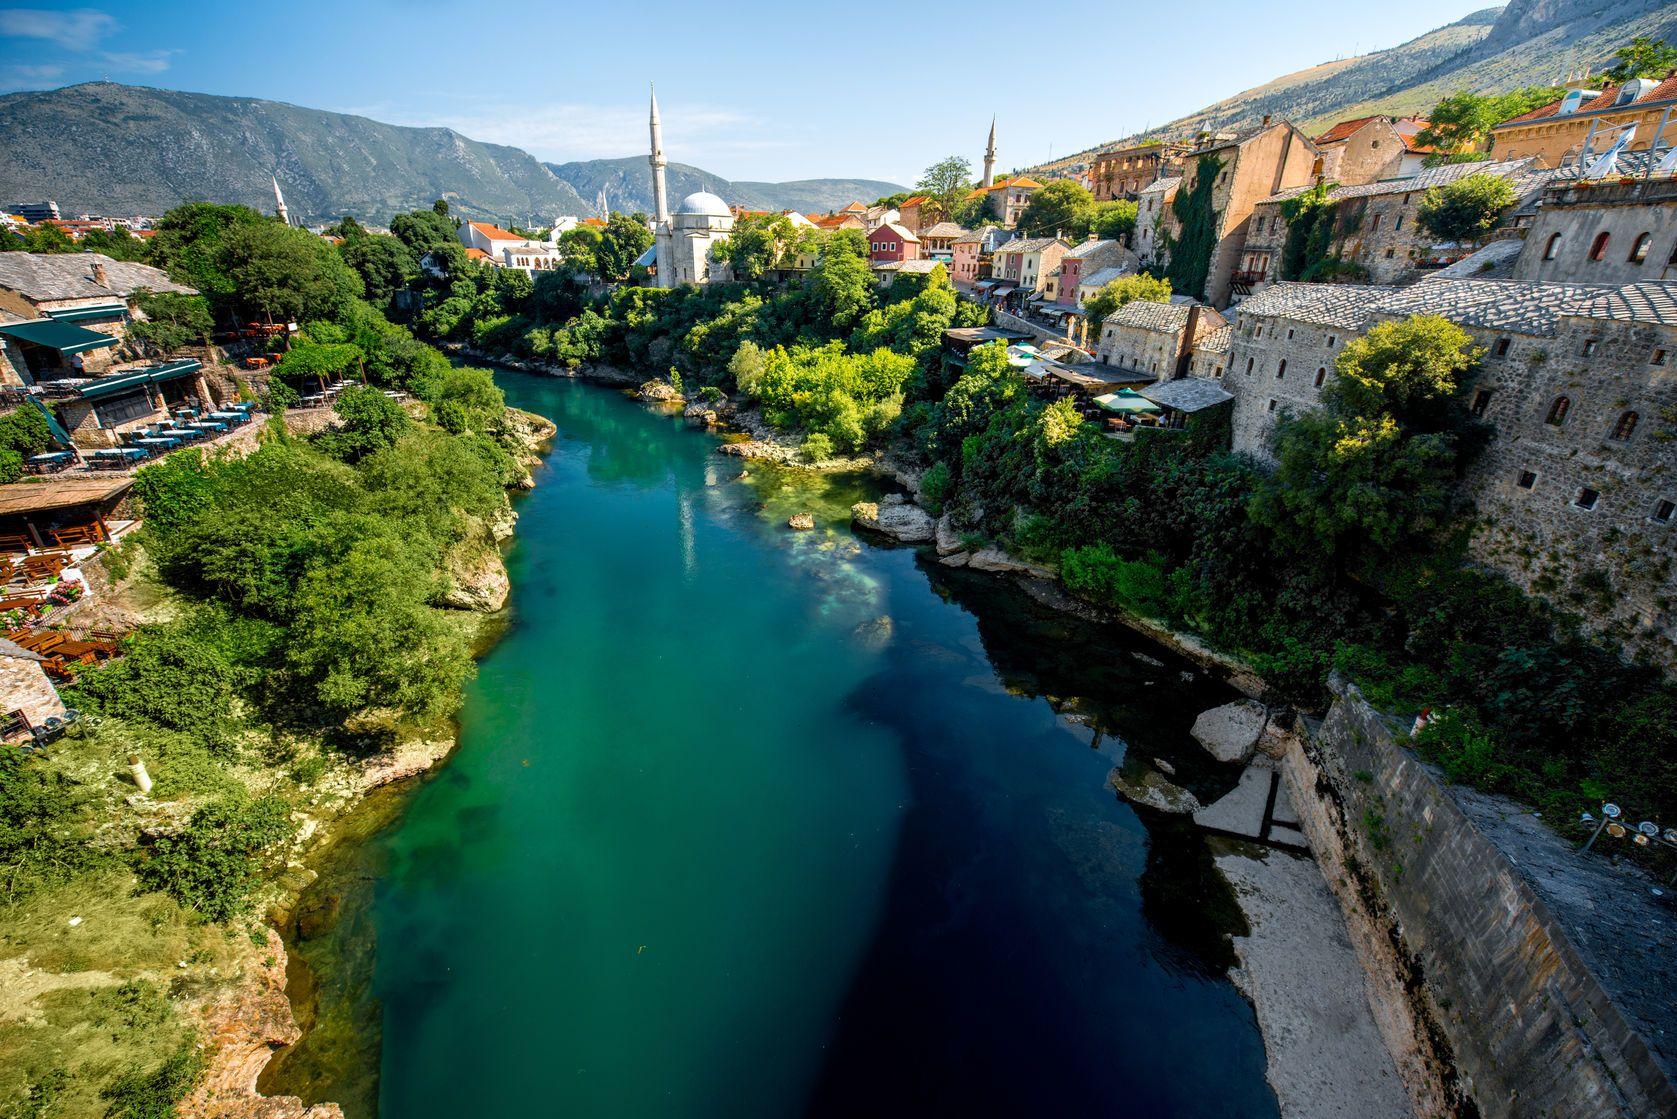 Koryto řeky Neretva v Mostaru | rh2010/123RF.com